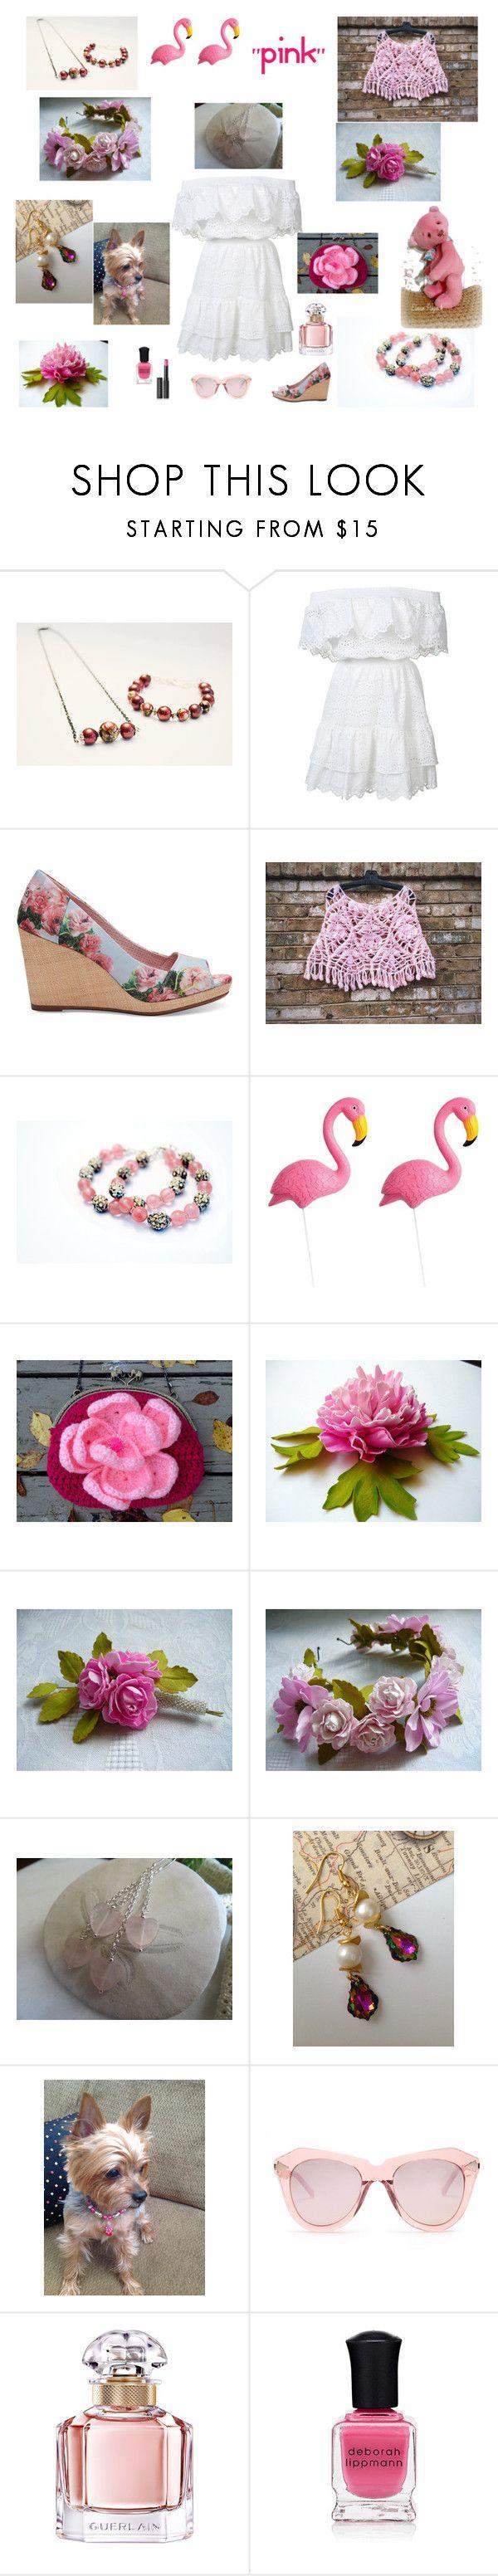 """PINK"" by artistinjewelry ❤ liked on Polyvore featuring LoveShackFancy, TOMS, Sunnylife, Karen Walker, Guerlain, Deborah Lippmann and Le Métier de Beauté"